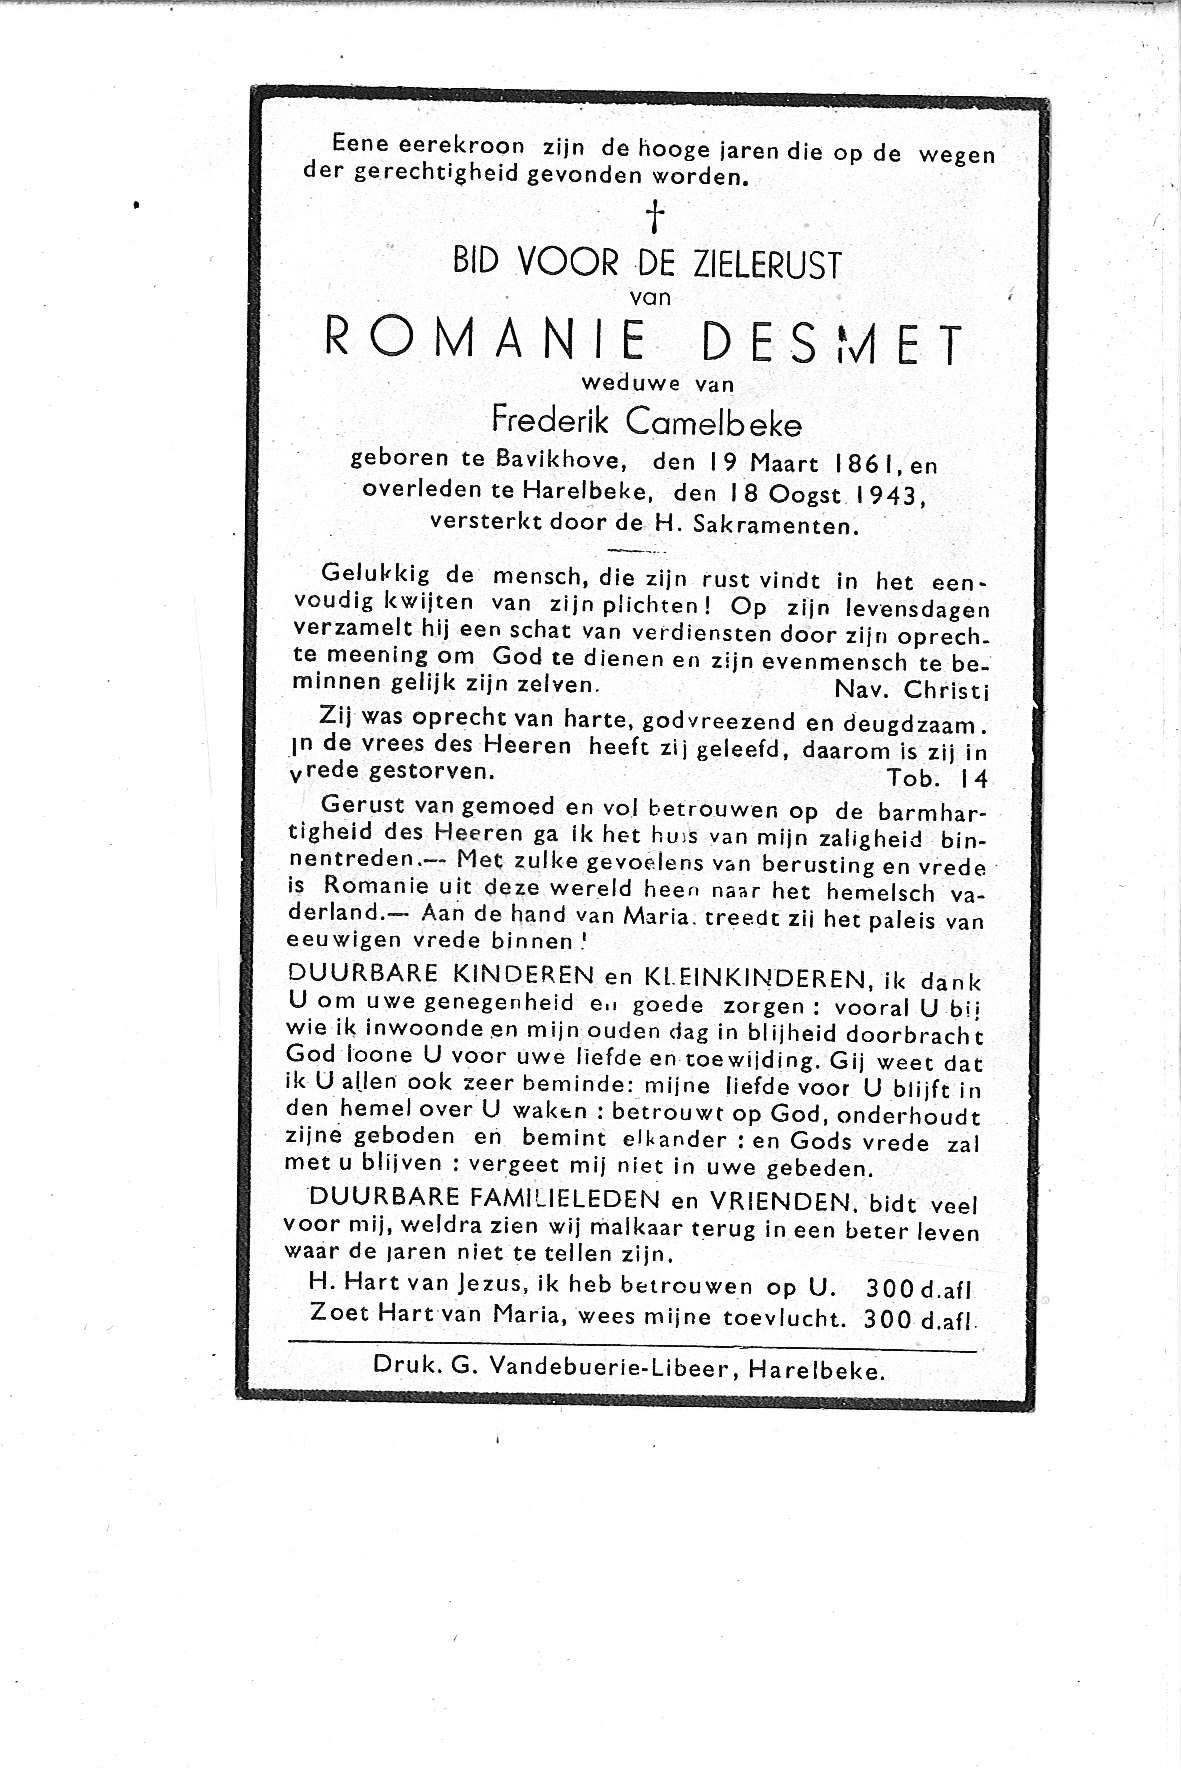 Romanie (1943) 20120424113911_00195.jpg